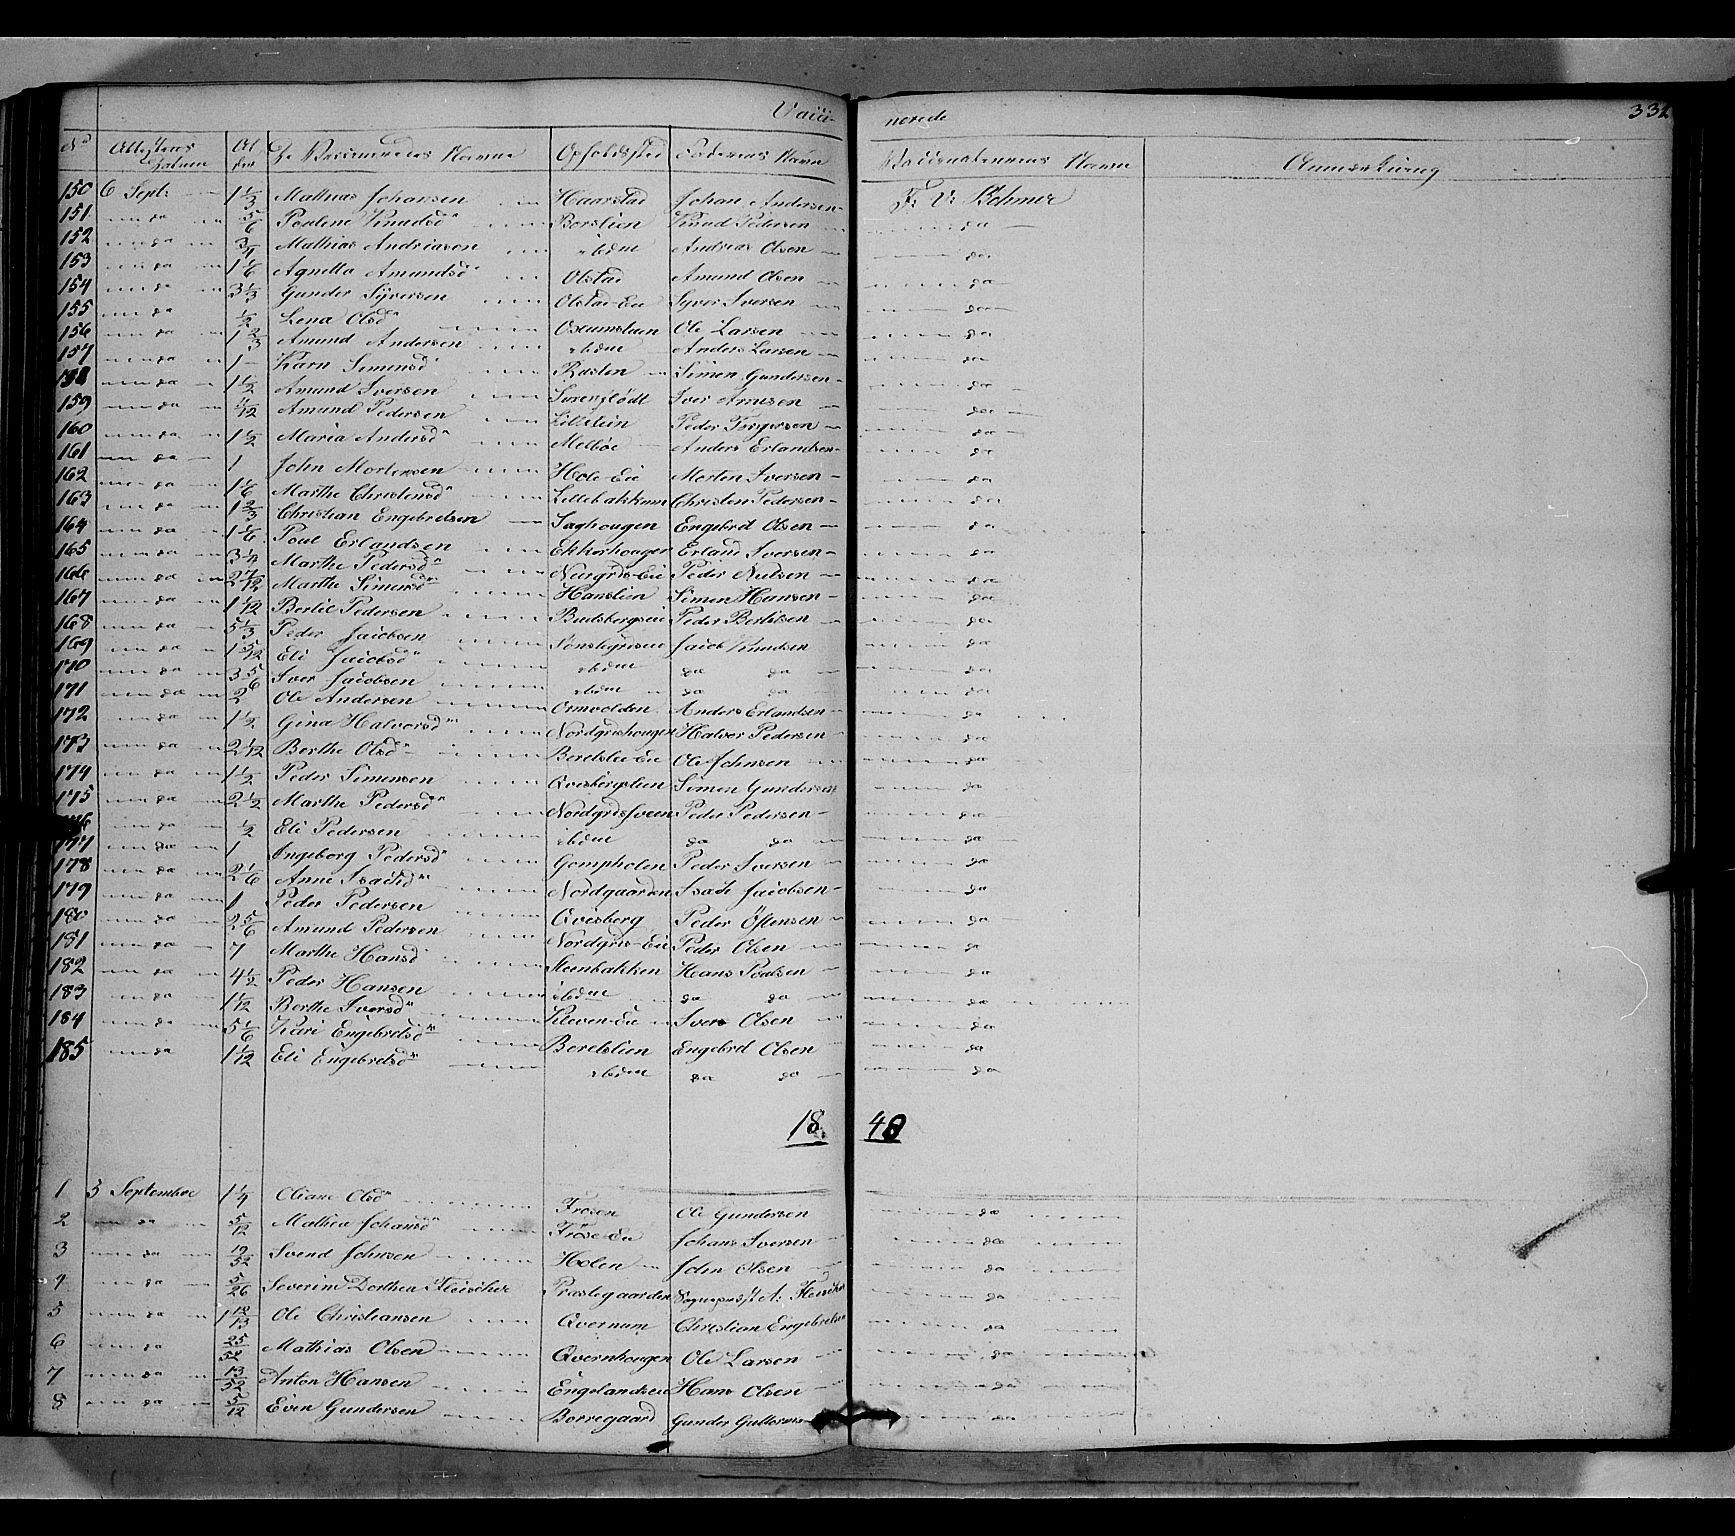 SAH, Gausdal prestekontor, Ministerialbok nr. 7, 1840-1850, s. 331